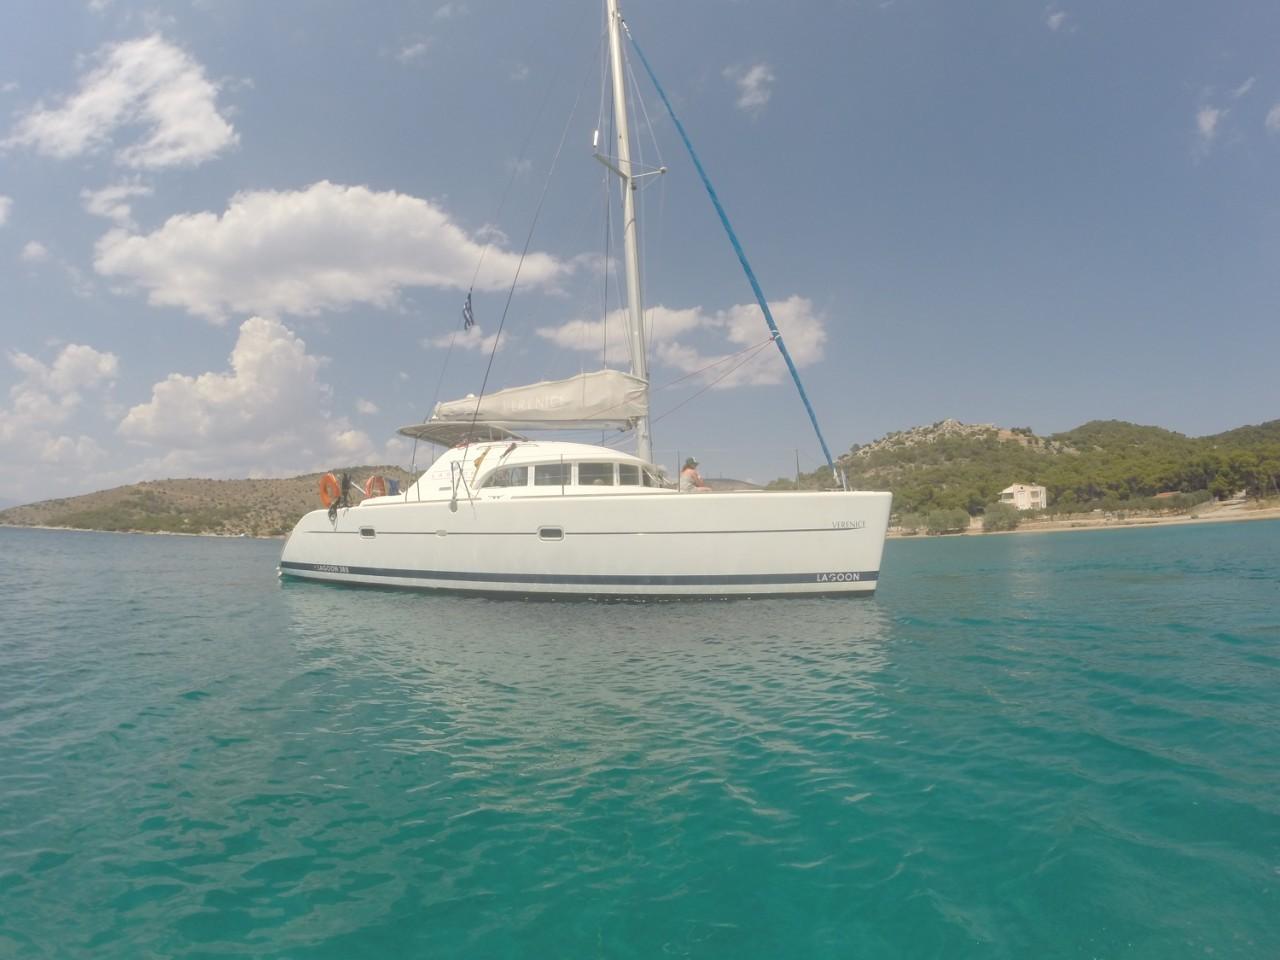 Круиз по трём островам из Афин, Морские прогулки на Яхте, Аренда Яхт